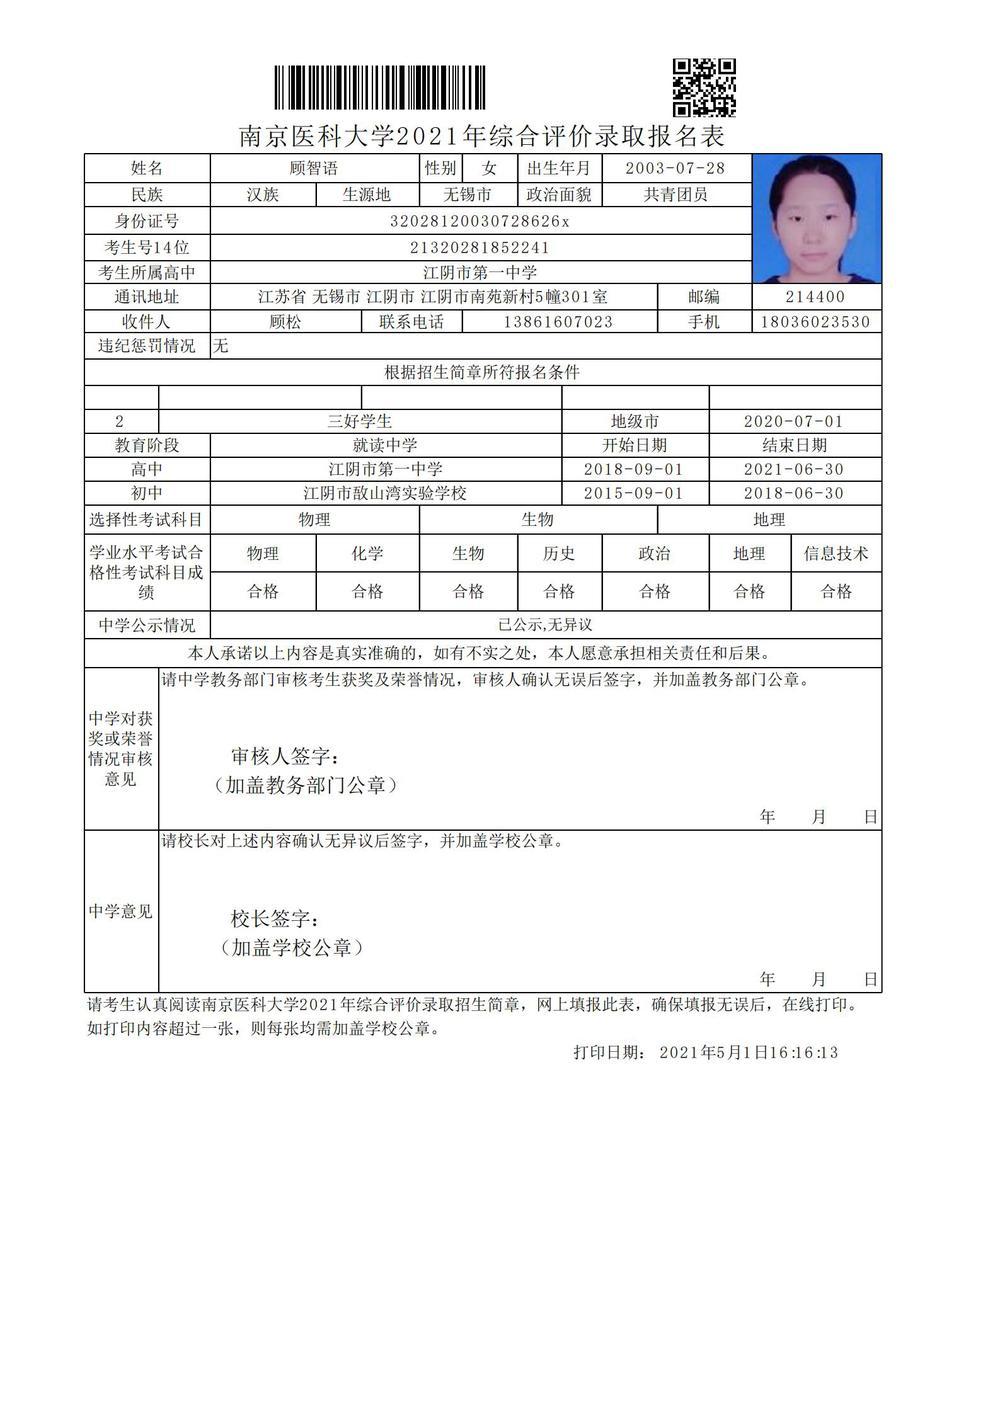 njmu_ZHPJ_BMB-待学校签字盖章_00.jpg